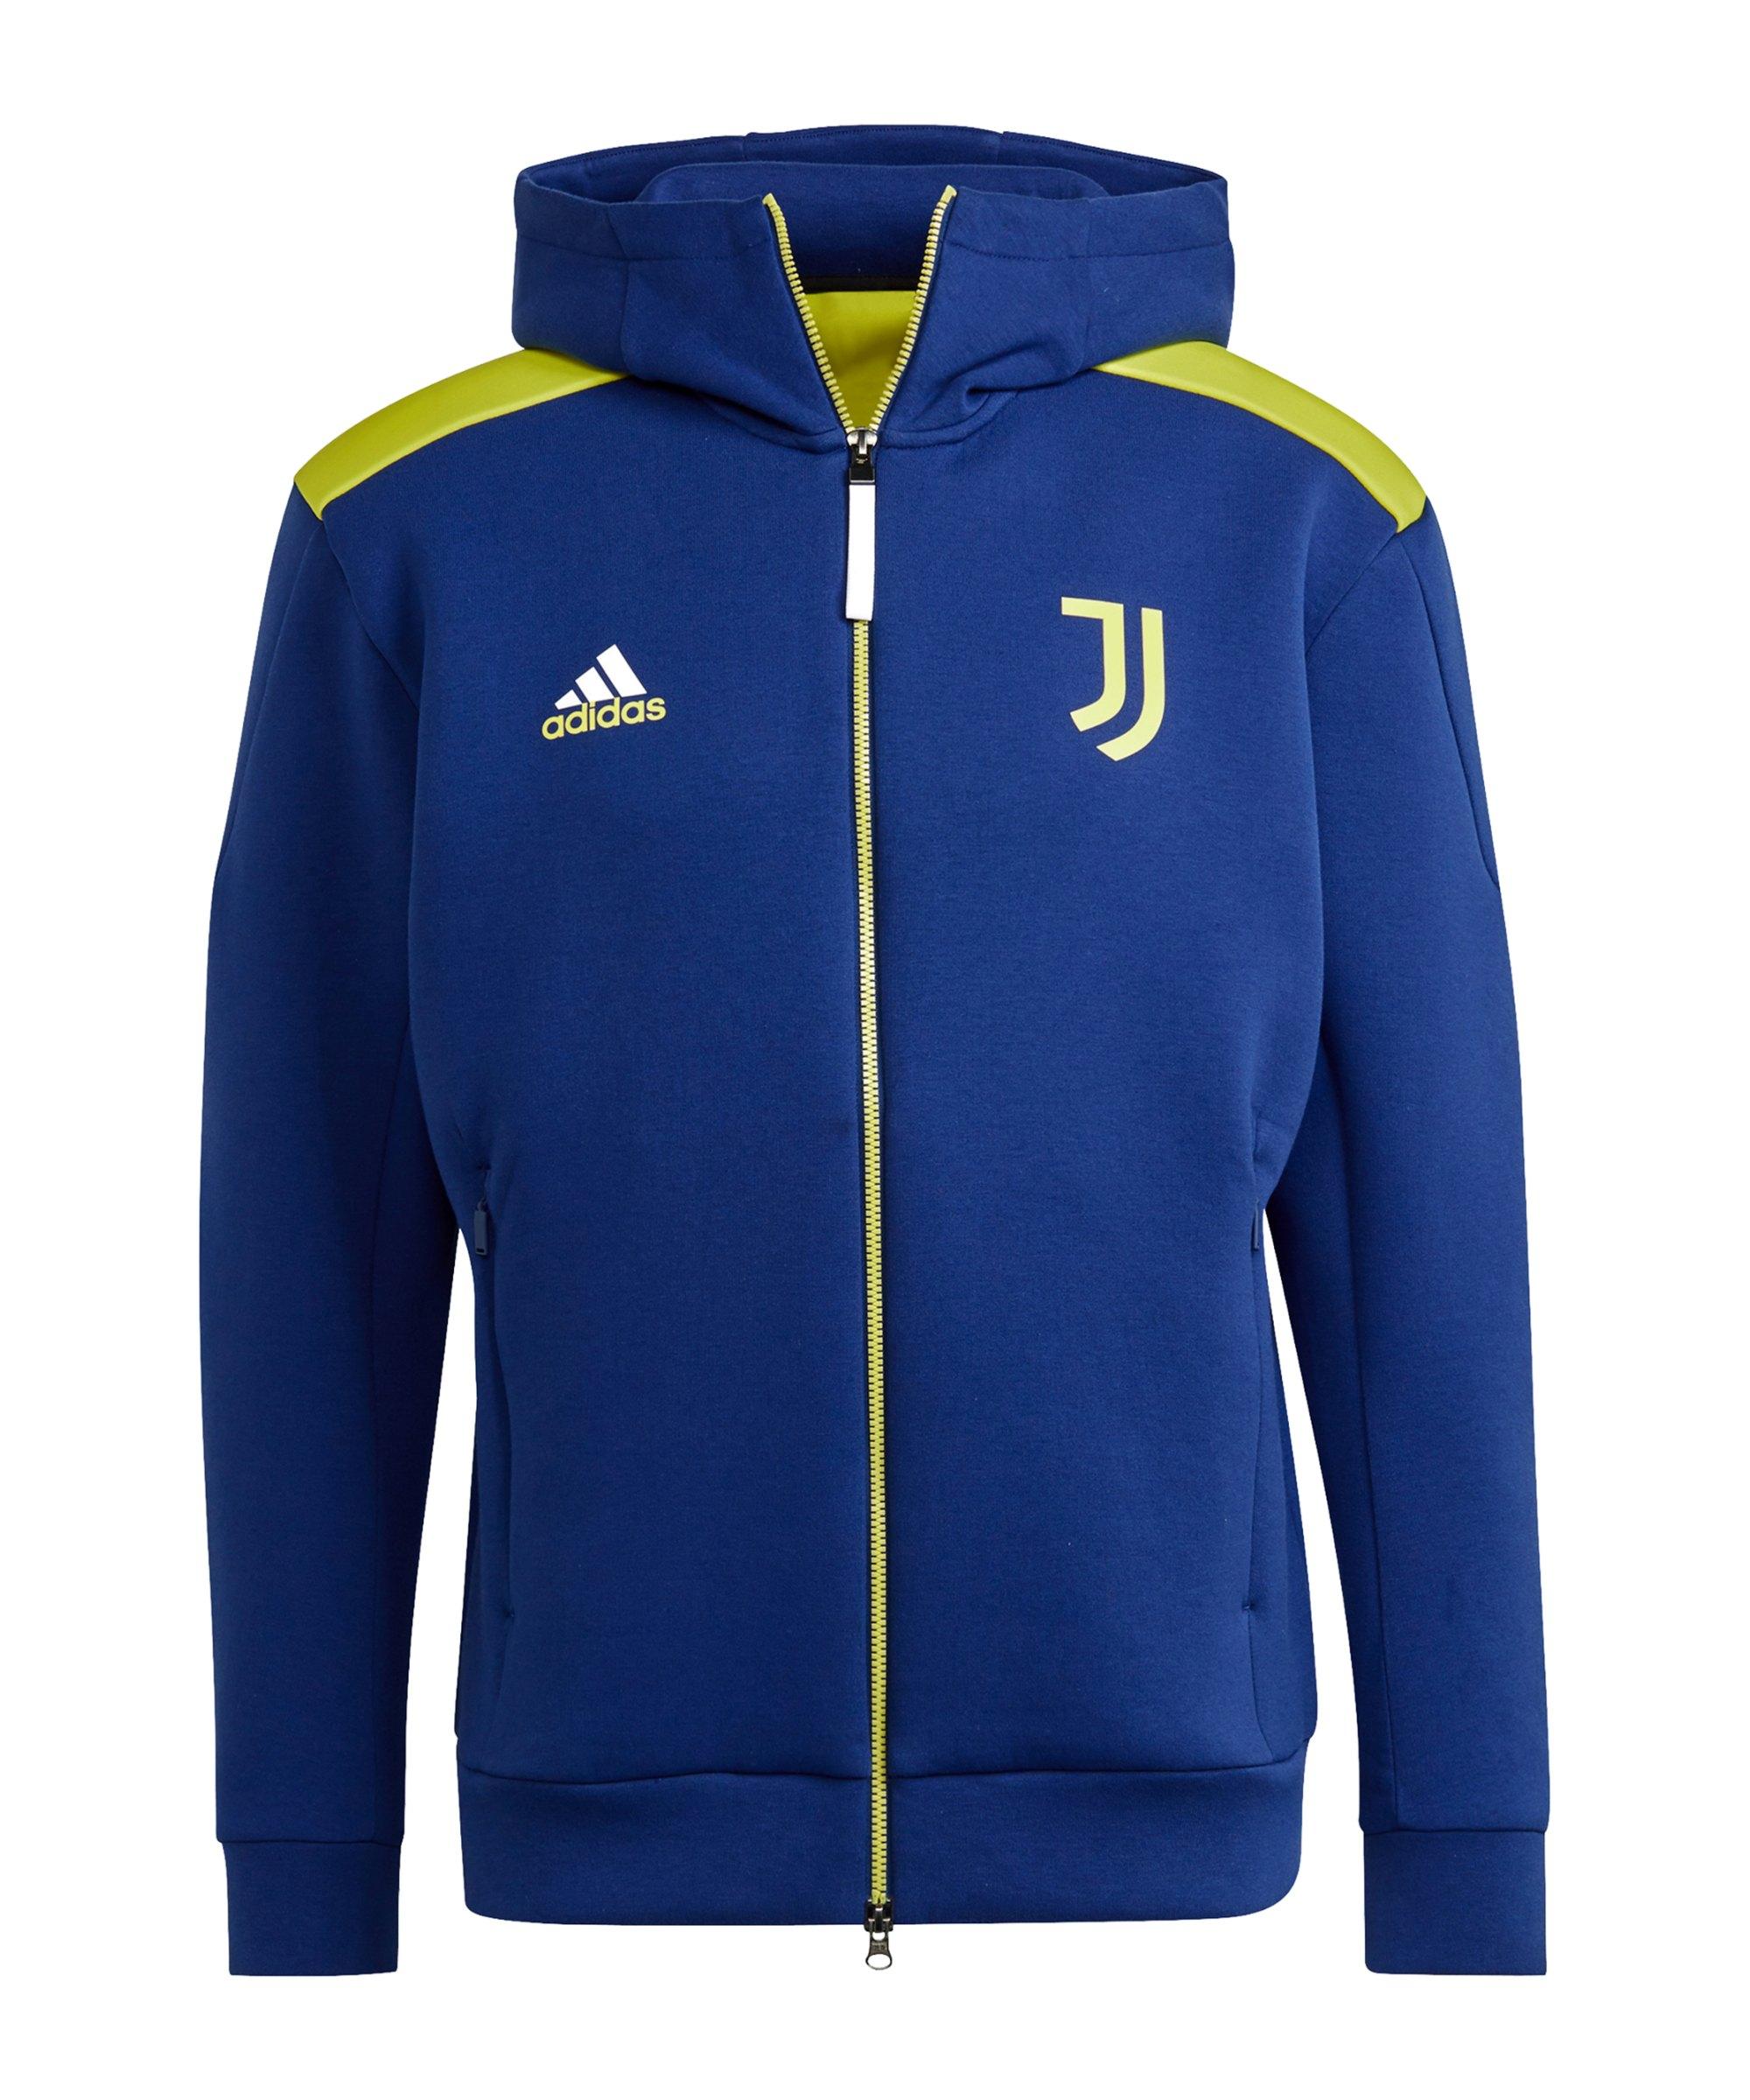 adidas Juventus Turin Z.N.E. Jacke Blau Gelb - blau